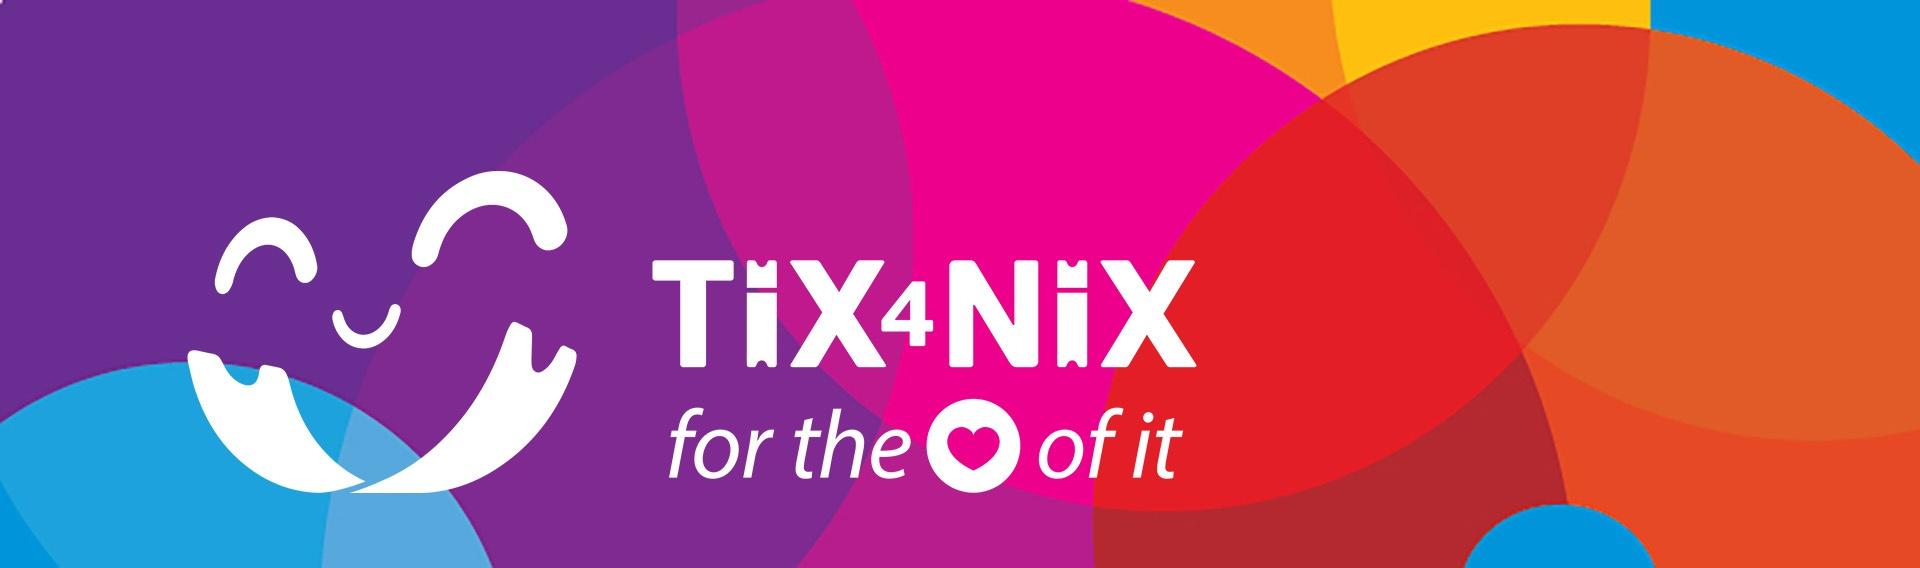 Tix4Nix Webhead_ColorBackground-1900w